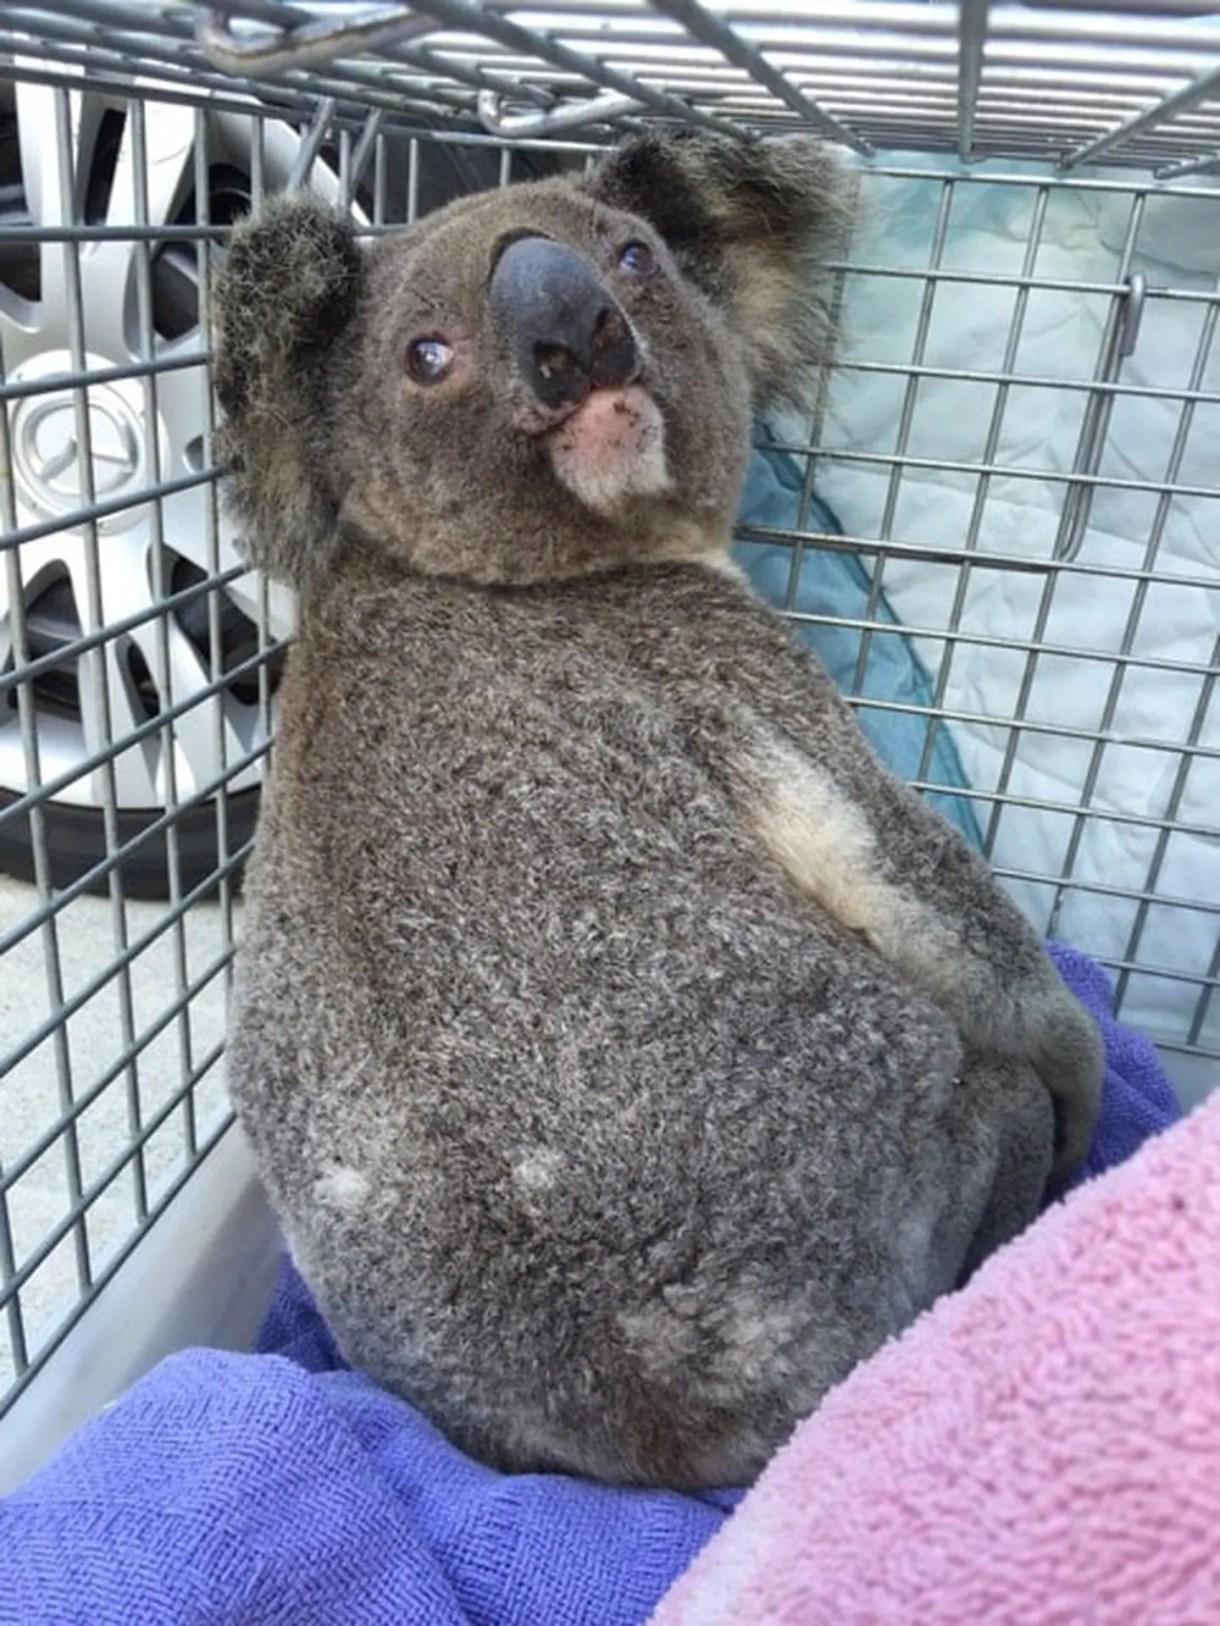 (Courtesy of Wildcare Australia Inc)